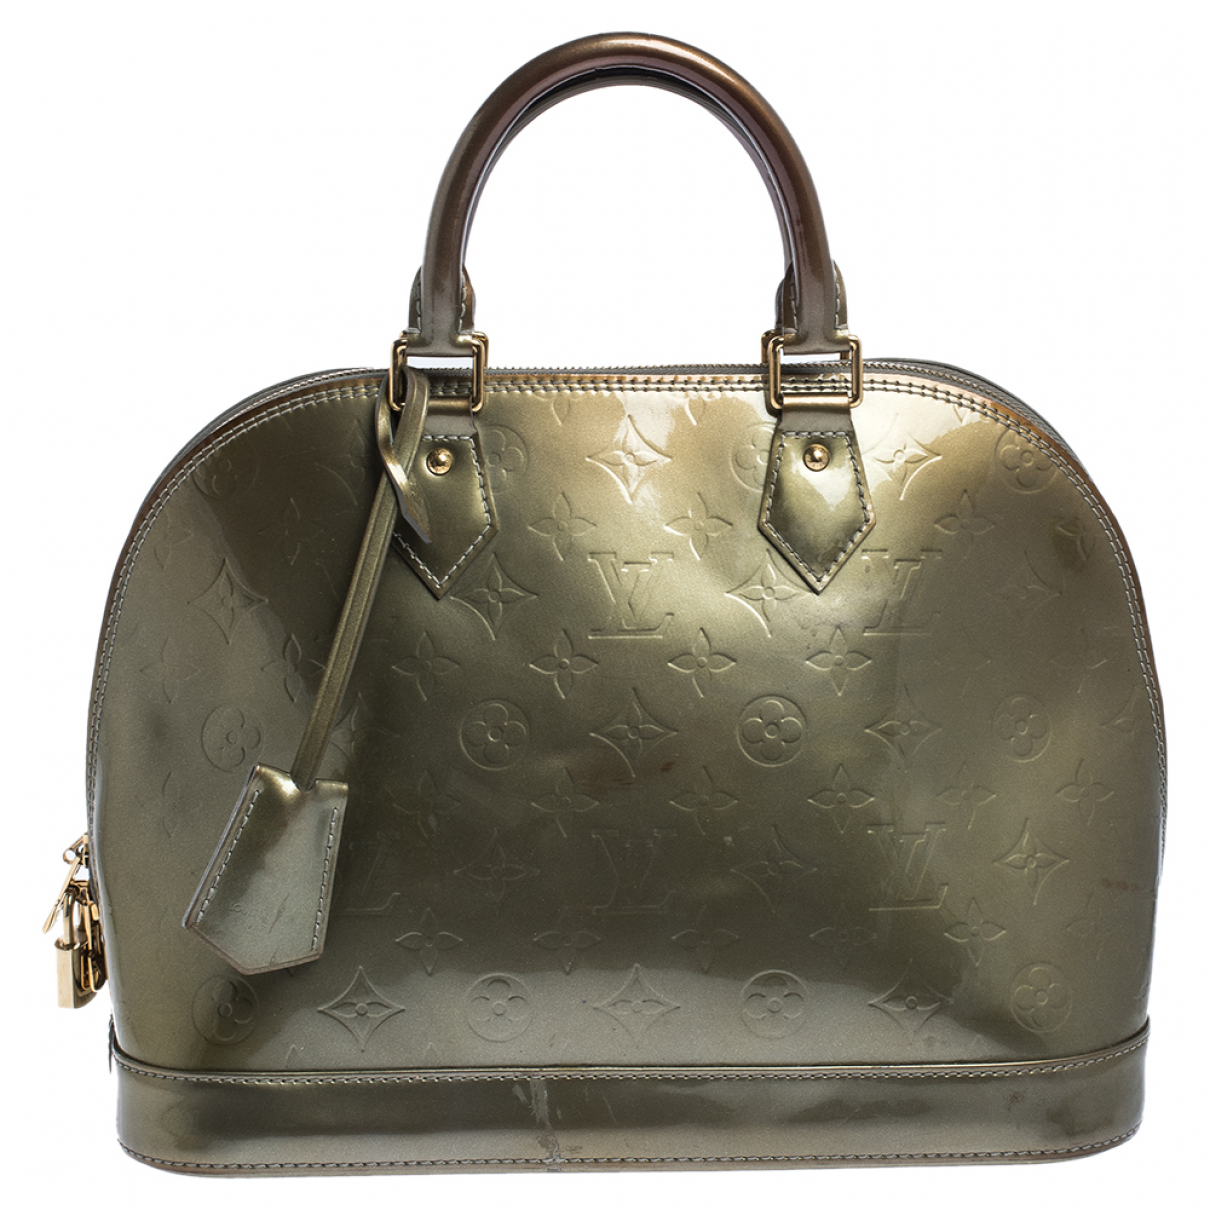 Louis Vuitton Alma Green Patent leather handbag for Women N